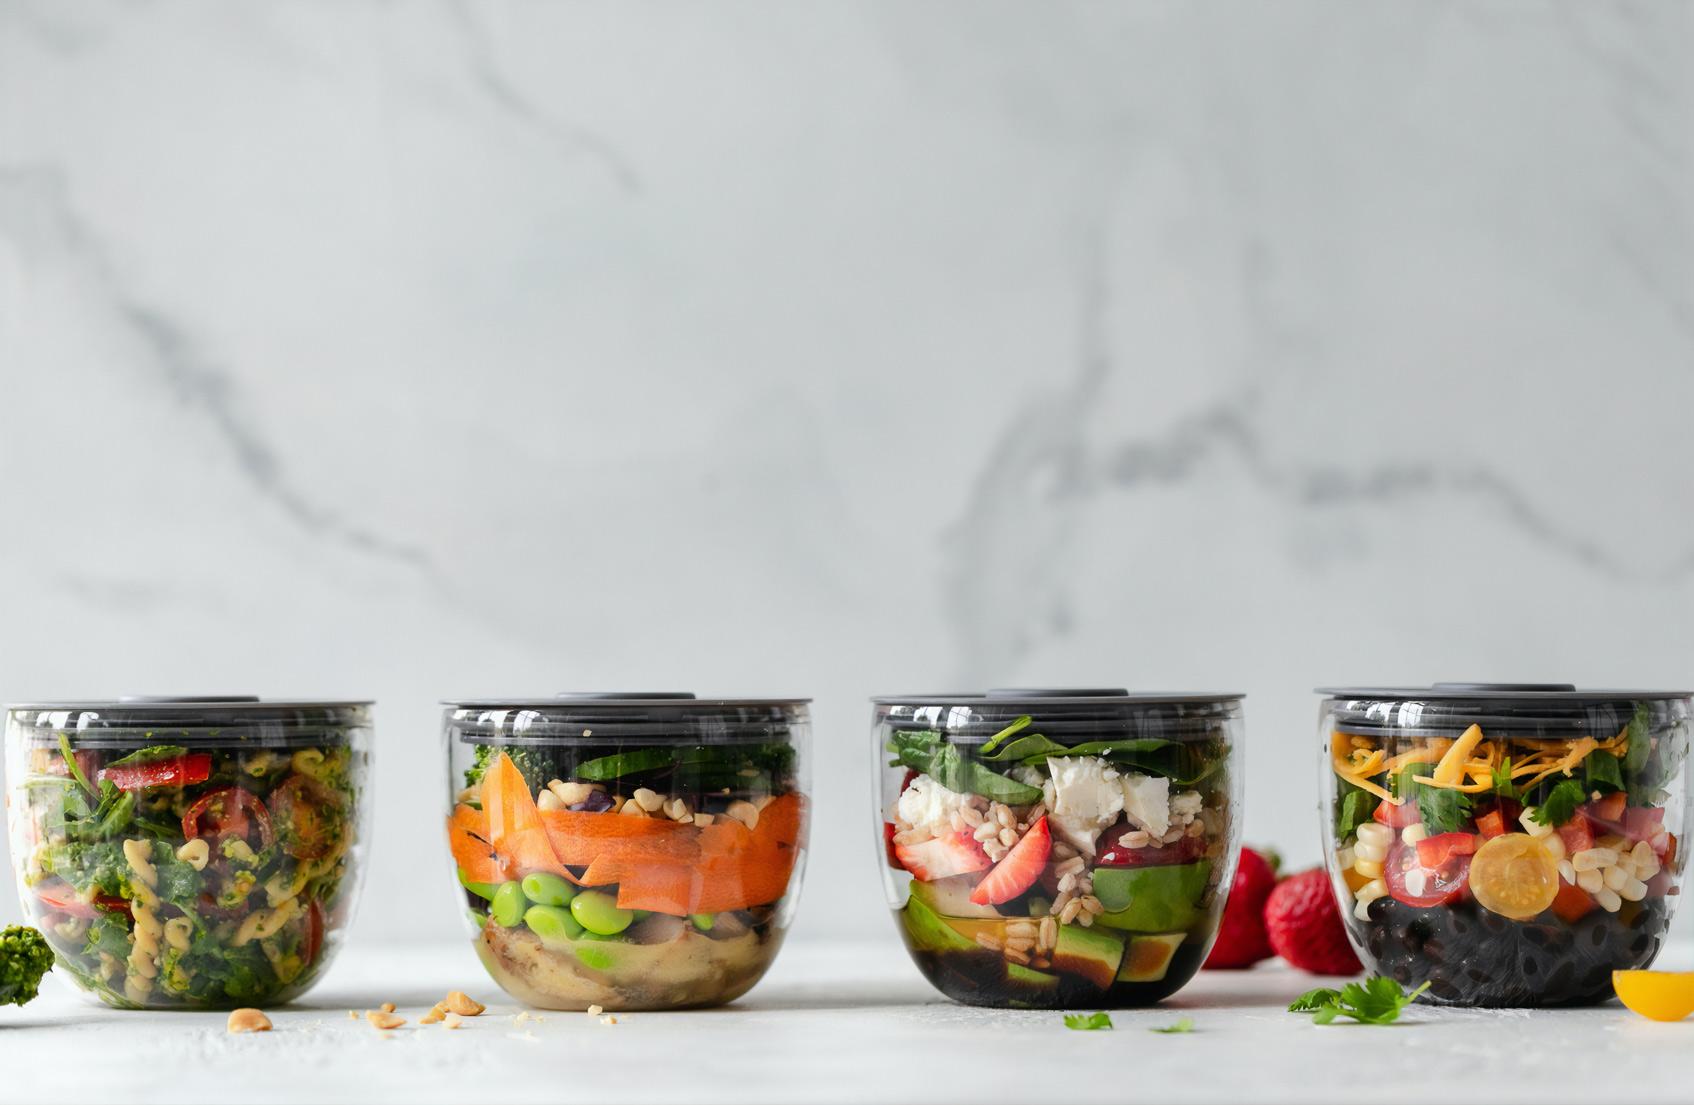 сервис доставки еды grow food